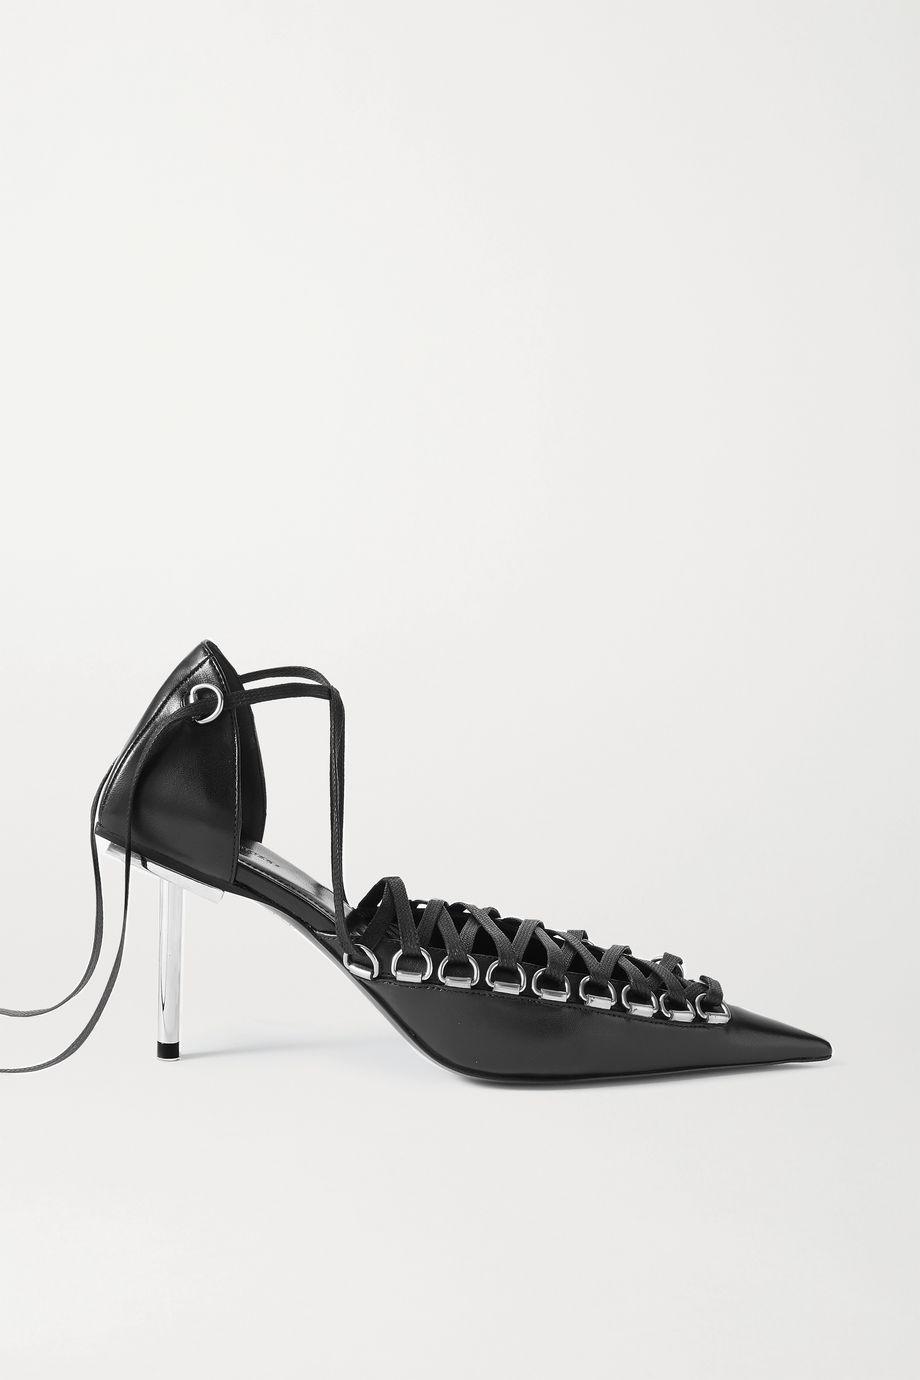 Balenciaga Corset lace-up leather pumps